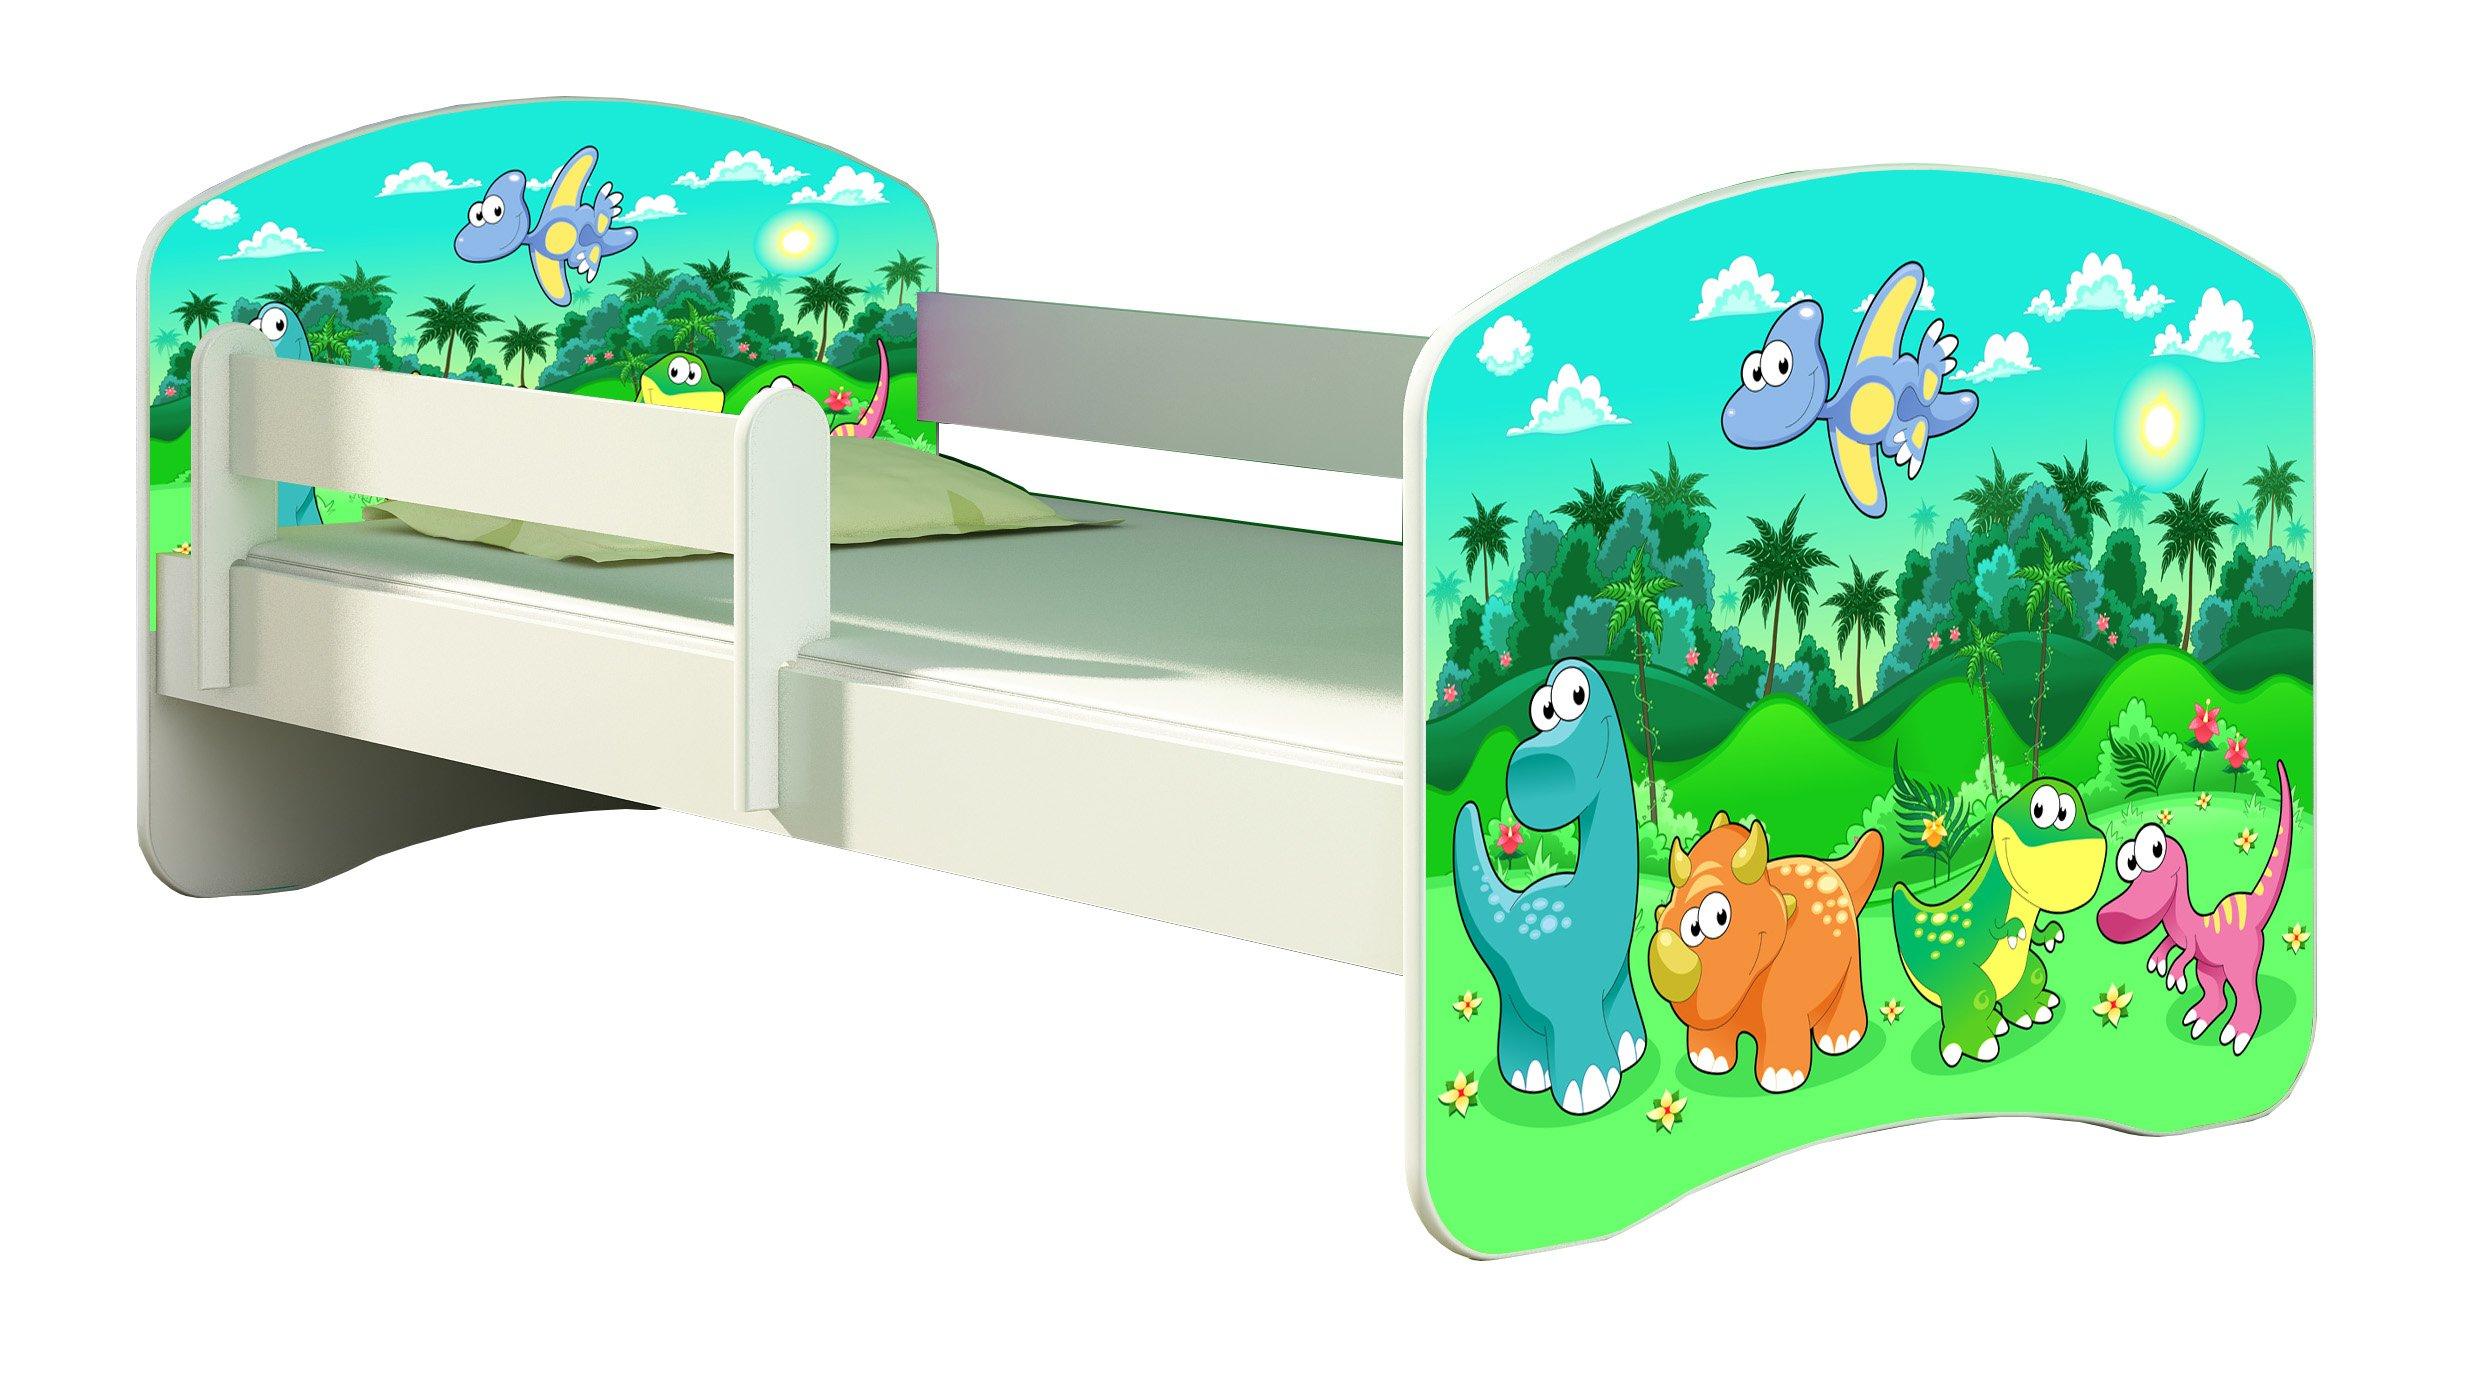 CHILDREN TODDLER KIDS BED + FREE MATTRESS 140x70 (30 Dinosaurs) ACMA  1